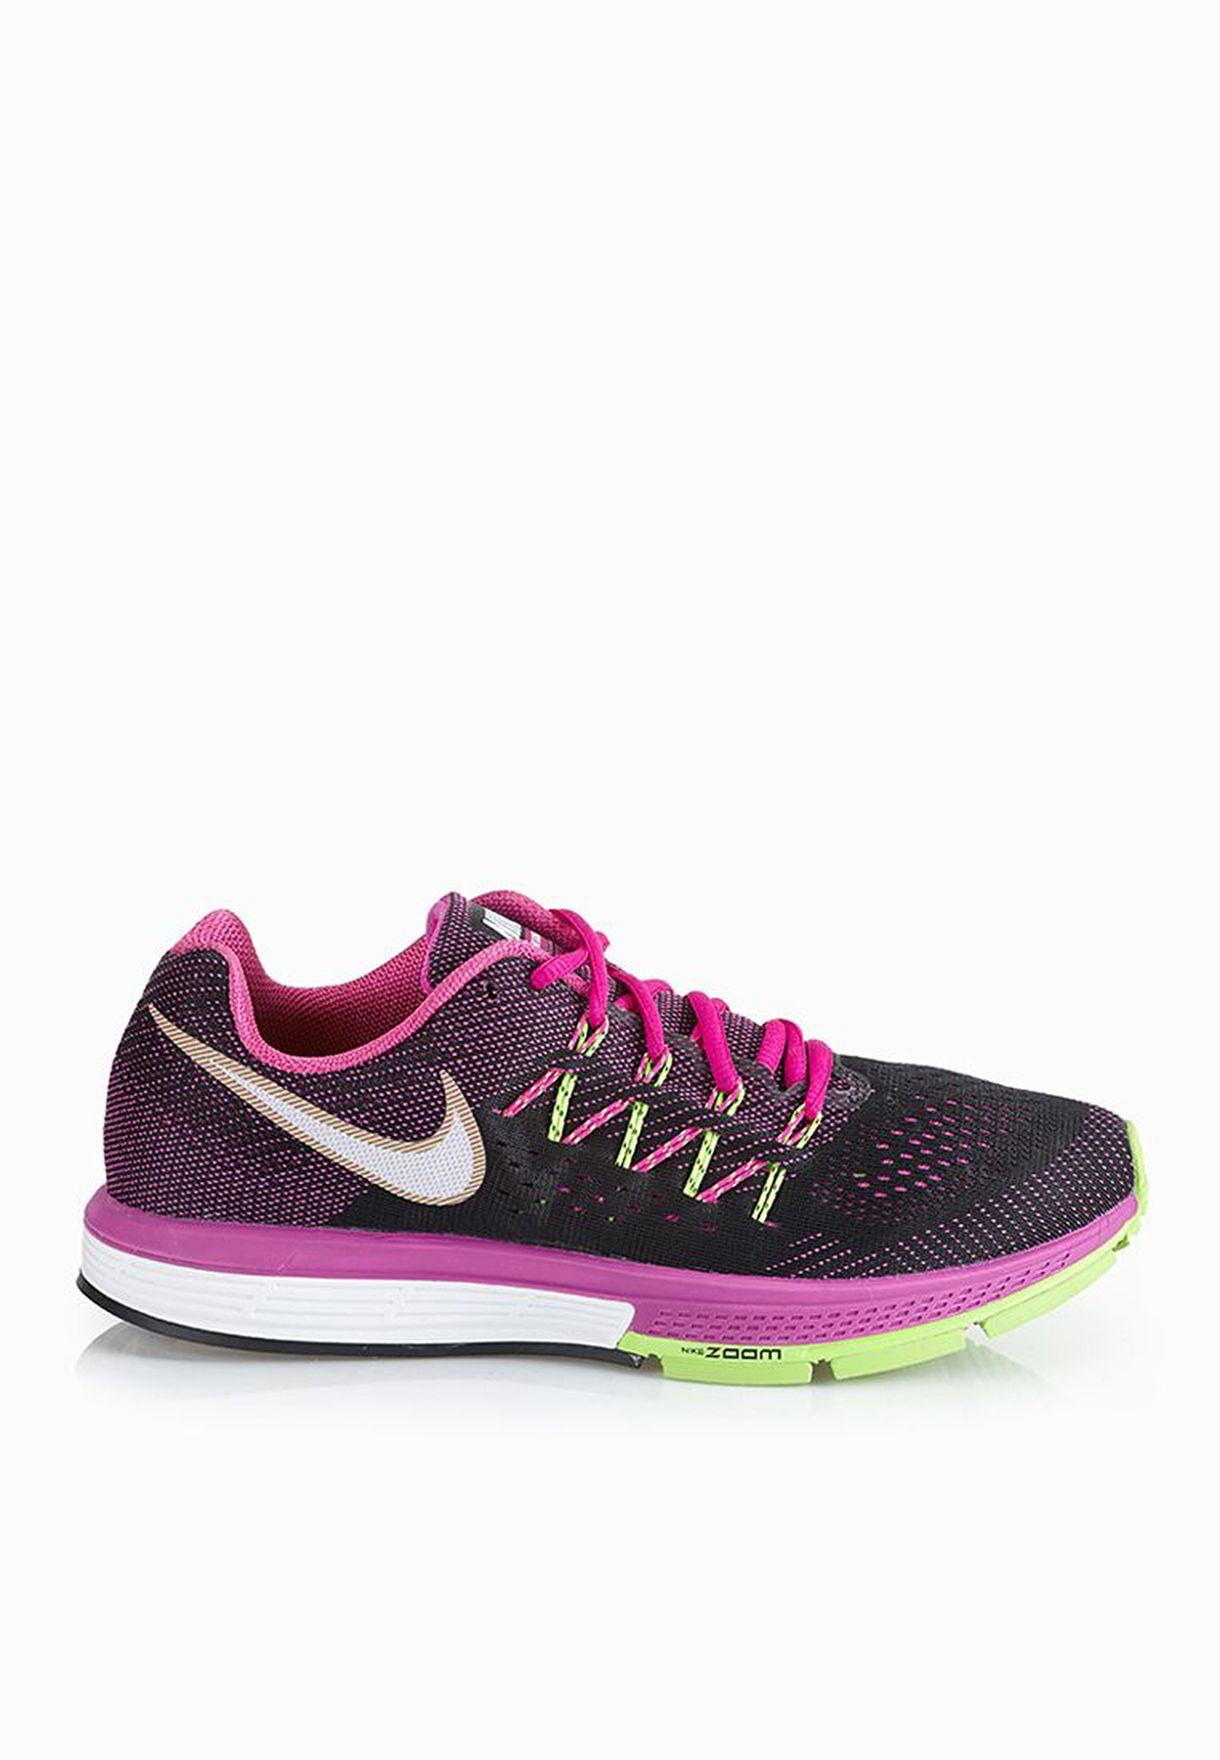 b13012e6d14a Shop Nike purple Air Zoom Vomero 10 Sneakers 717441-501 for Women in Qatar  - NI727SH25ZMG